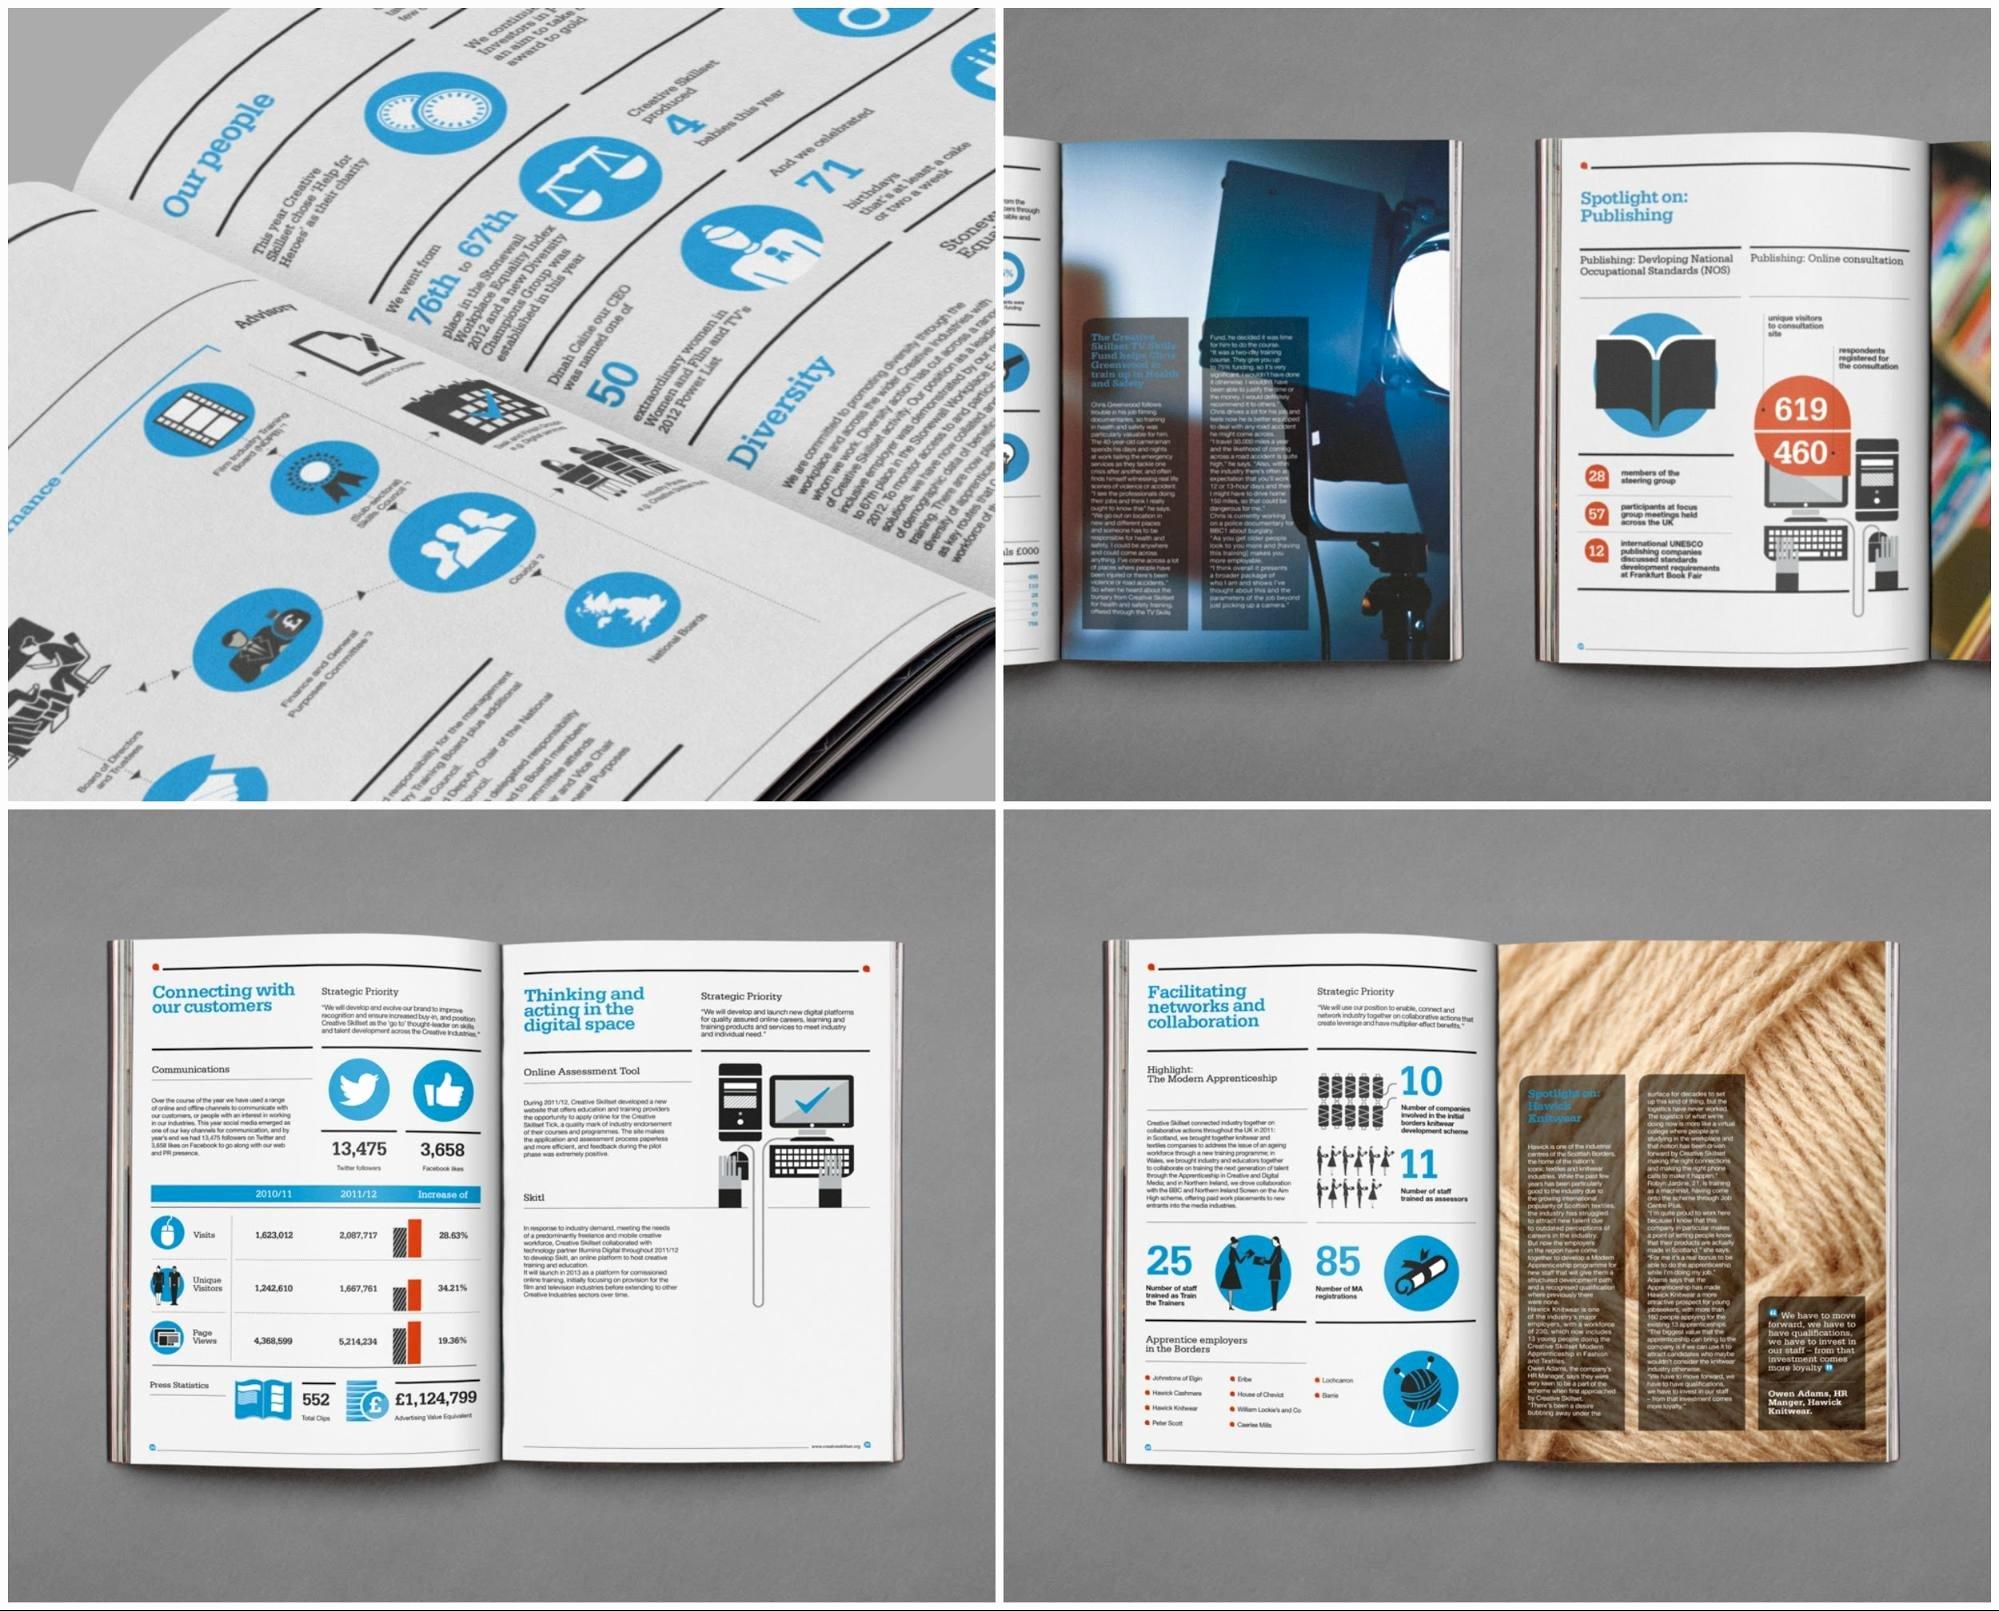 Annual Financial Report Template Beautiful 55 Customizable Annual Report Templates Examples & Tips